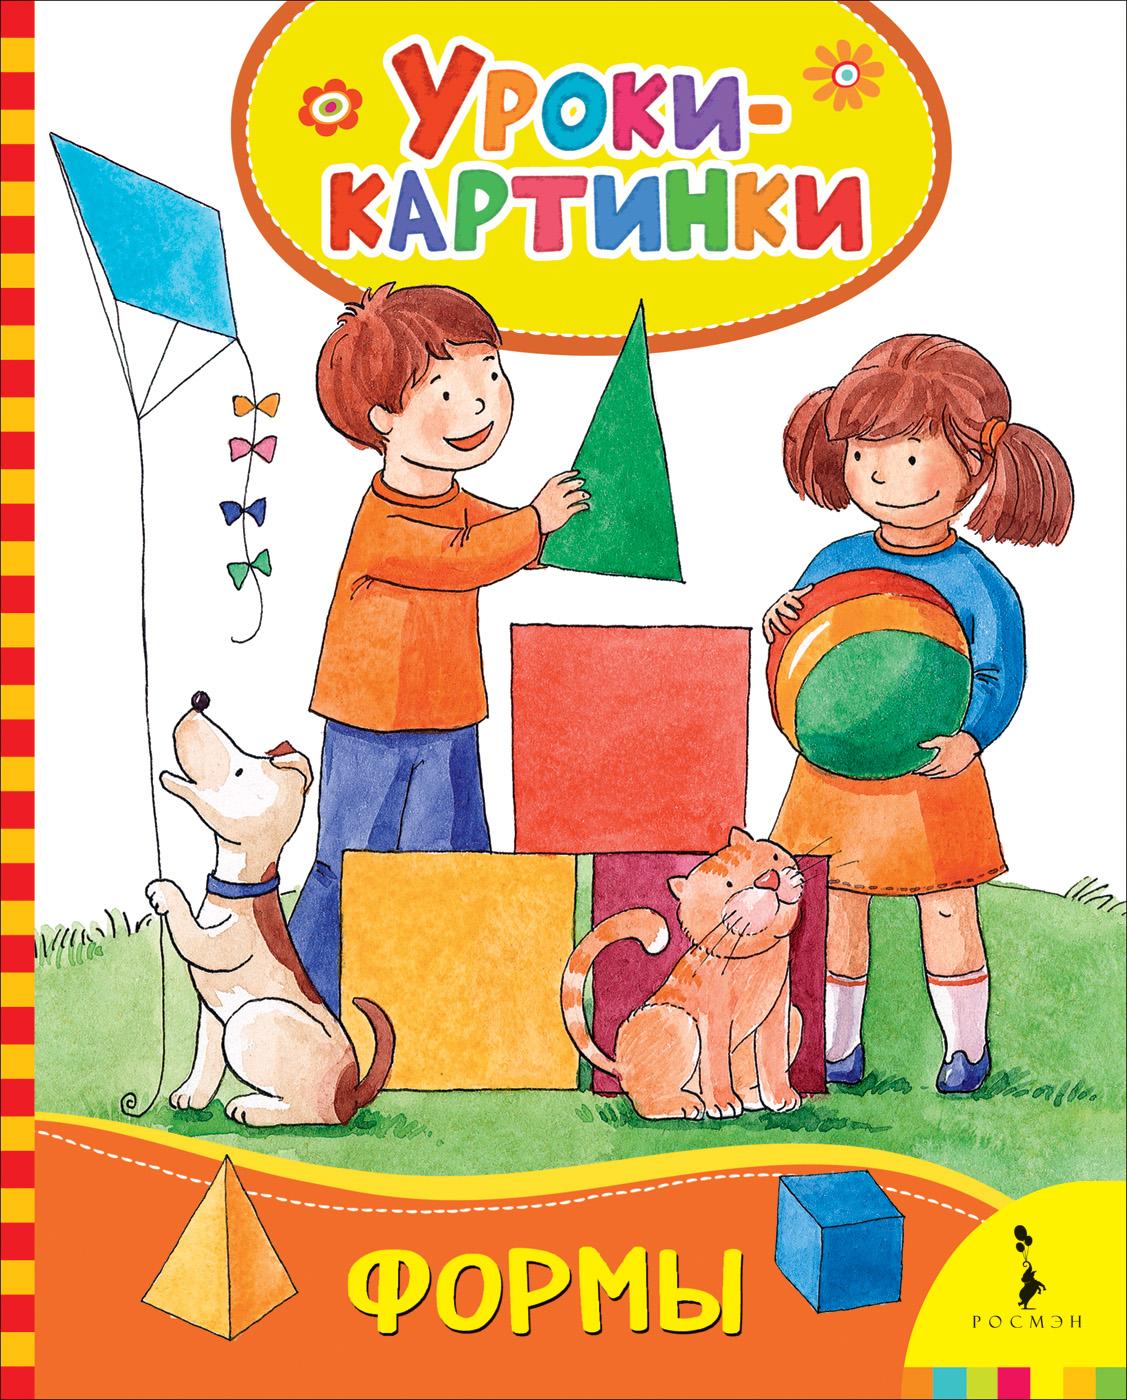 Мазанова Е. К. Формы (Уроки-картинки)